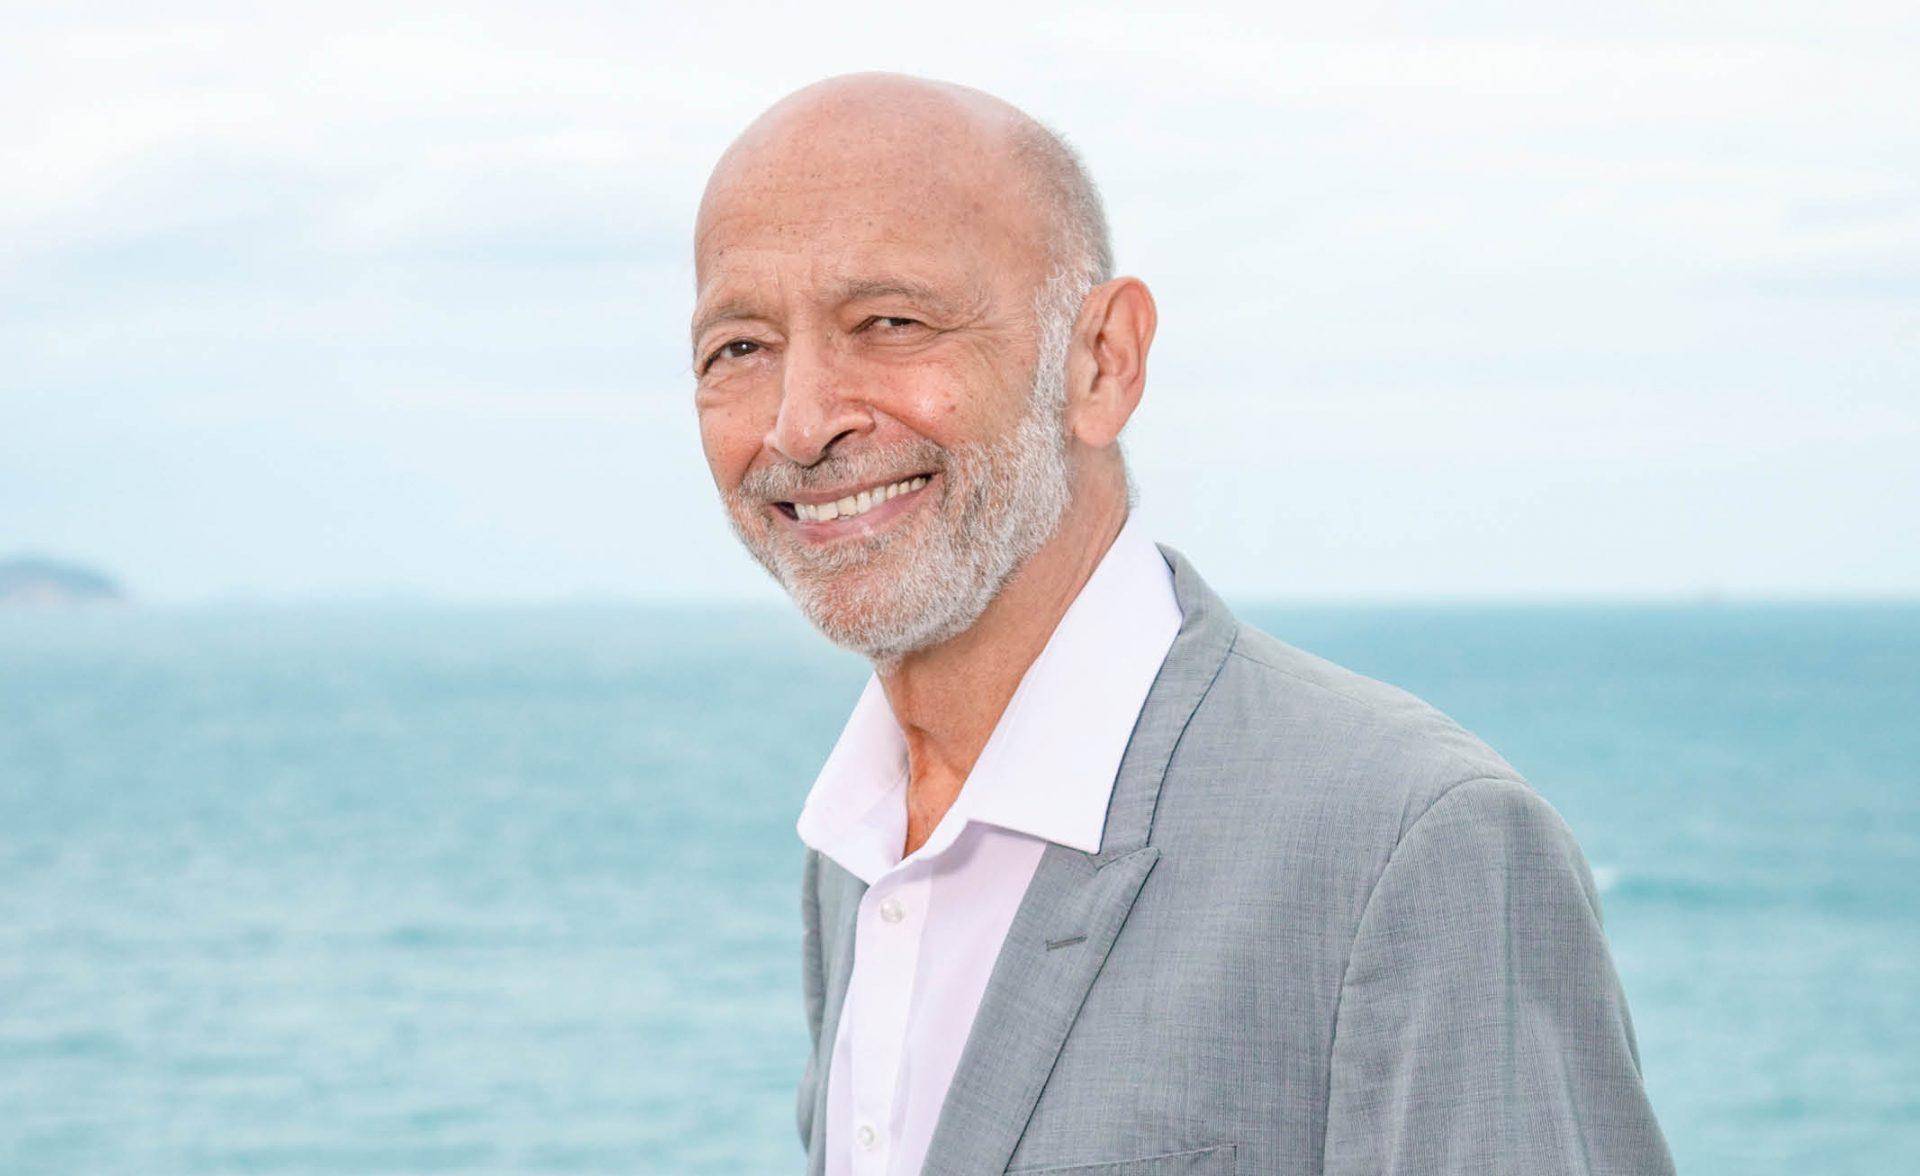 Entrevista alexandre kalache envelhecimento